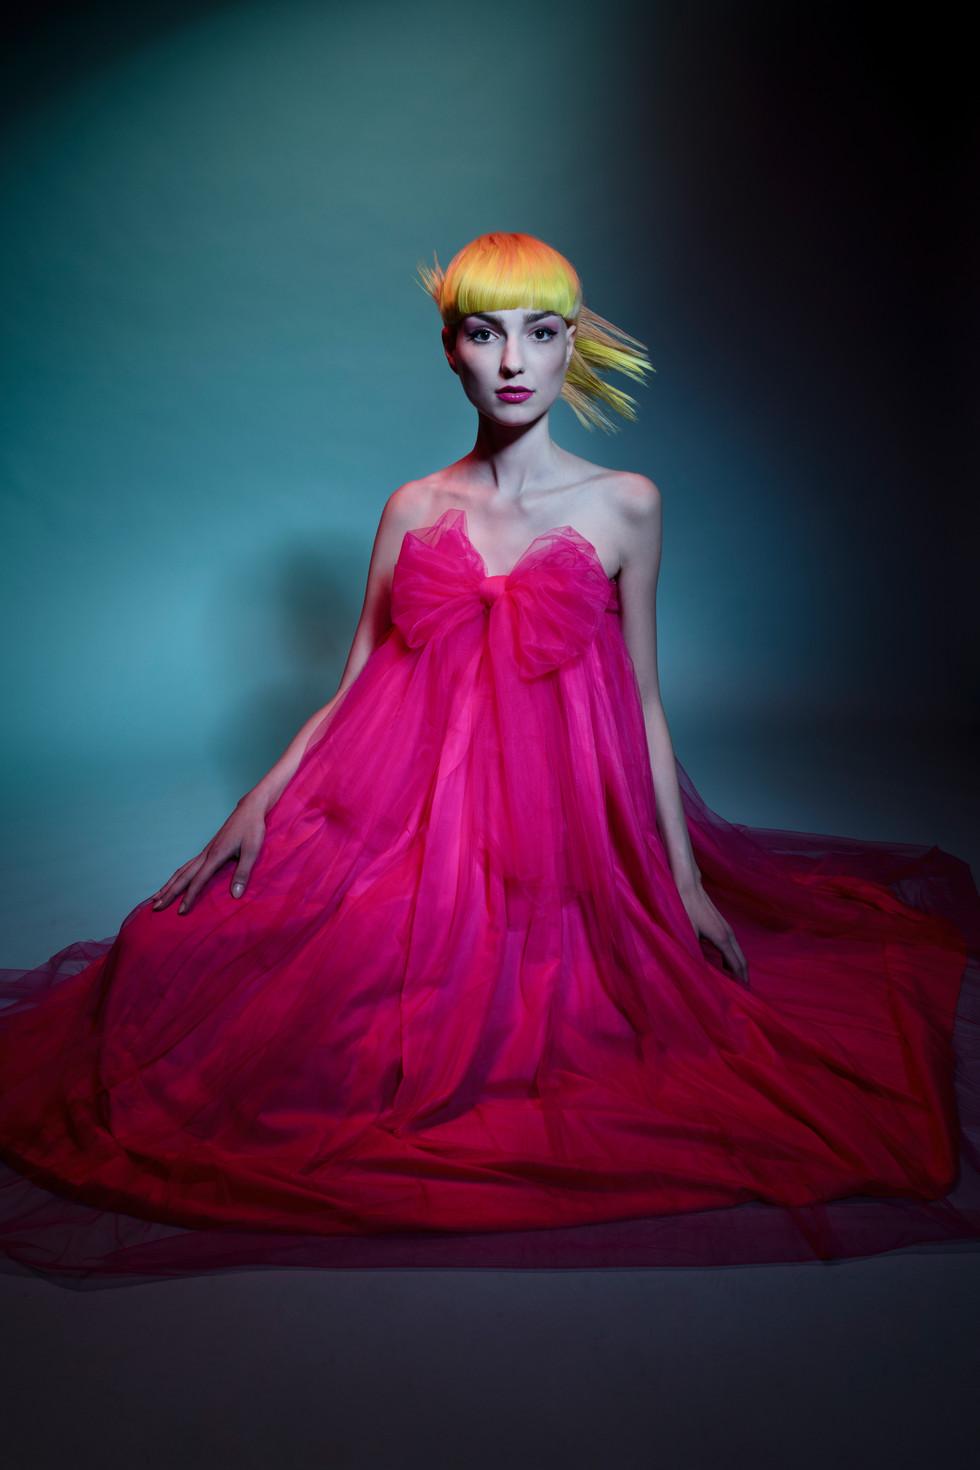 Laura, Hair & Beauty, J7, creative look, color, vlado golub photography, Vlado Golub Fotografie